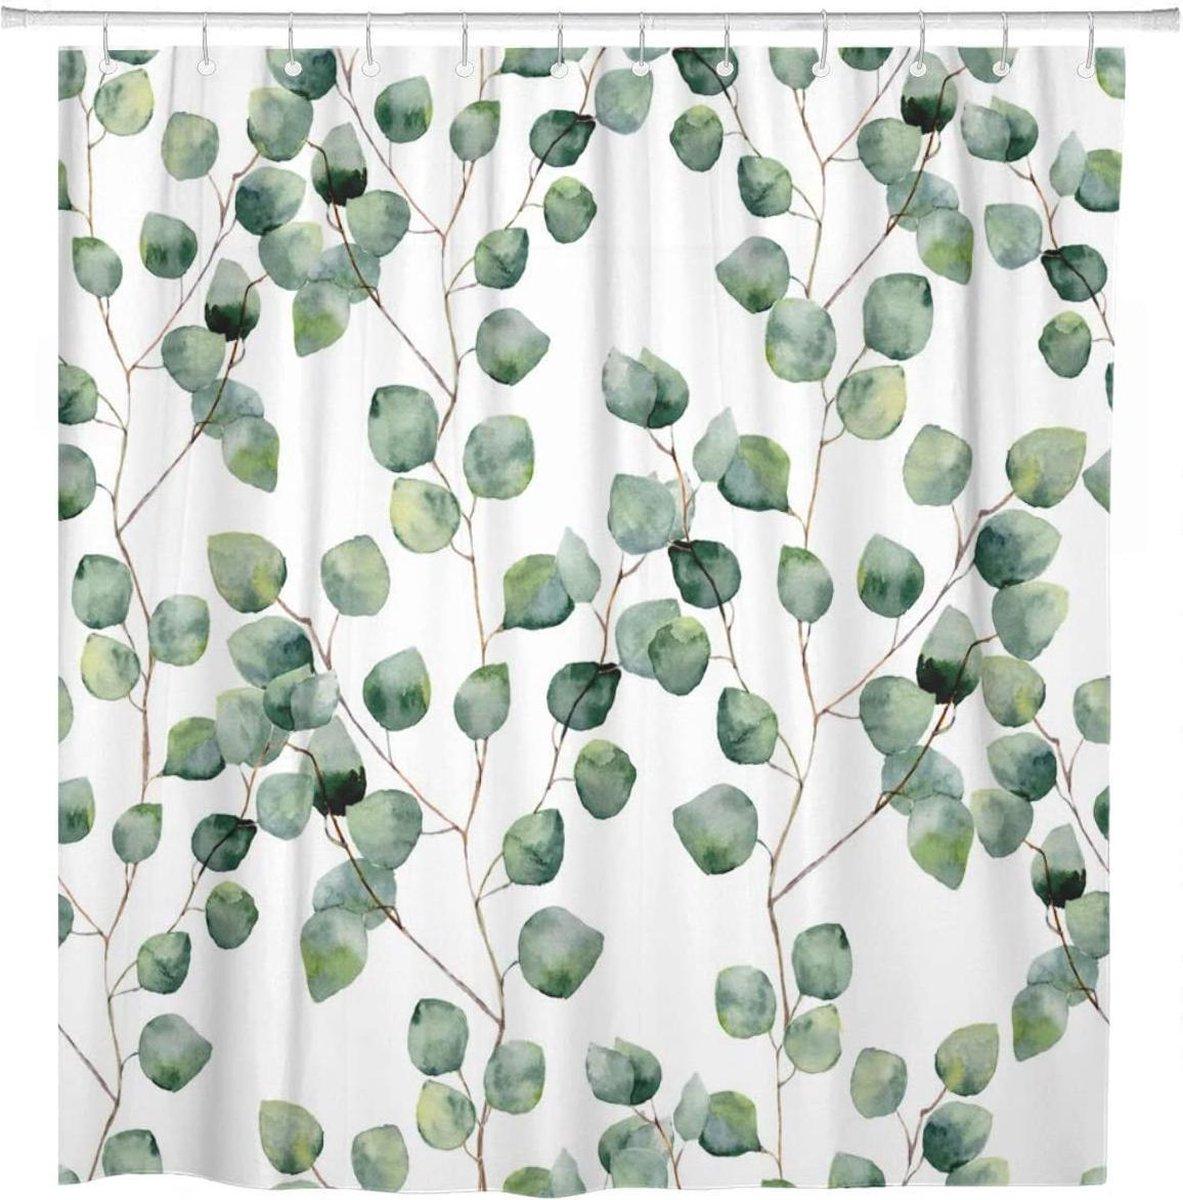 Douchegordijn Badkamer Accessoires - 180x200 cm - Eucalyptus